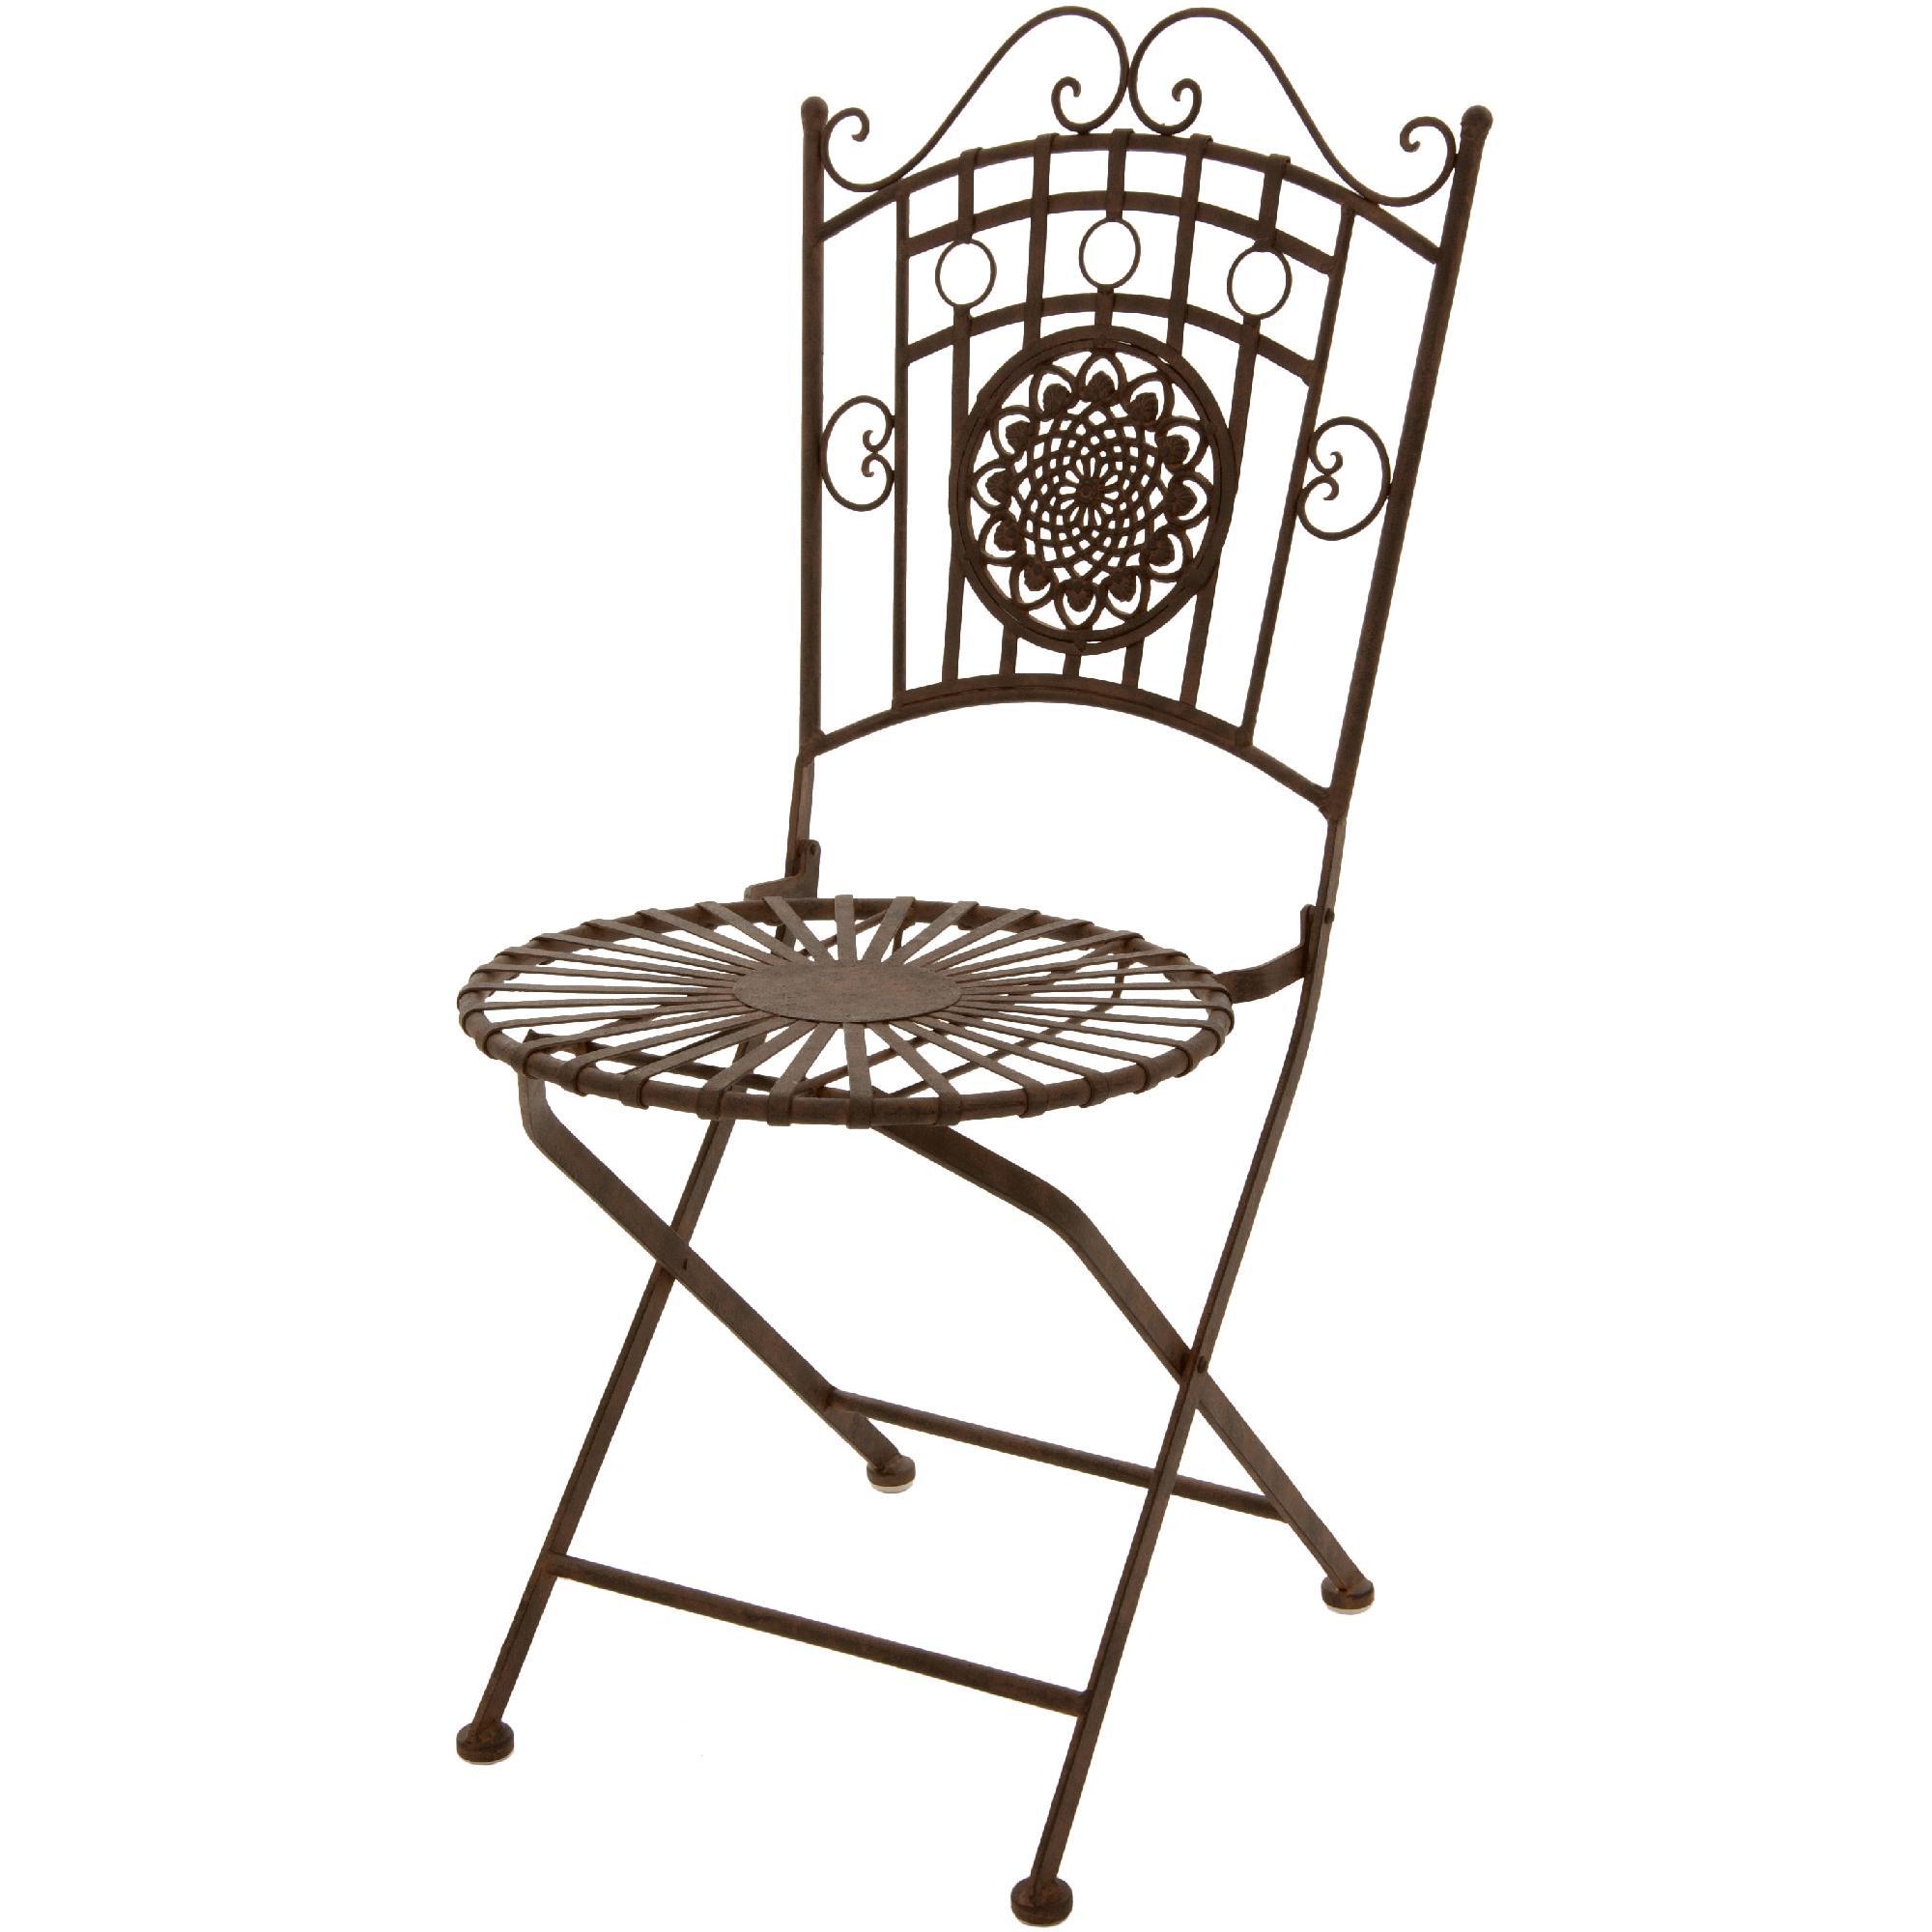 Oriental Furniture Wrought Iron Garden Chair  Rust Patina